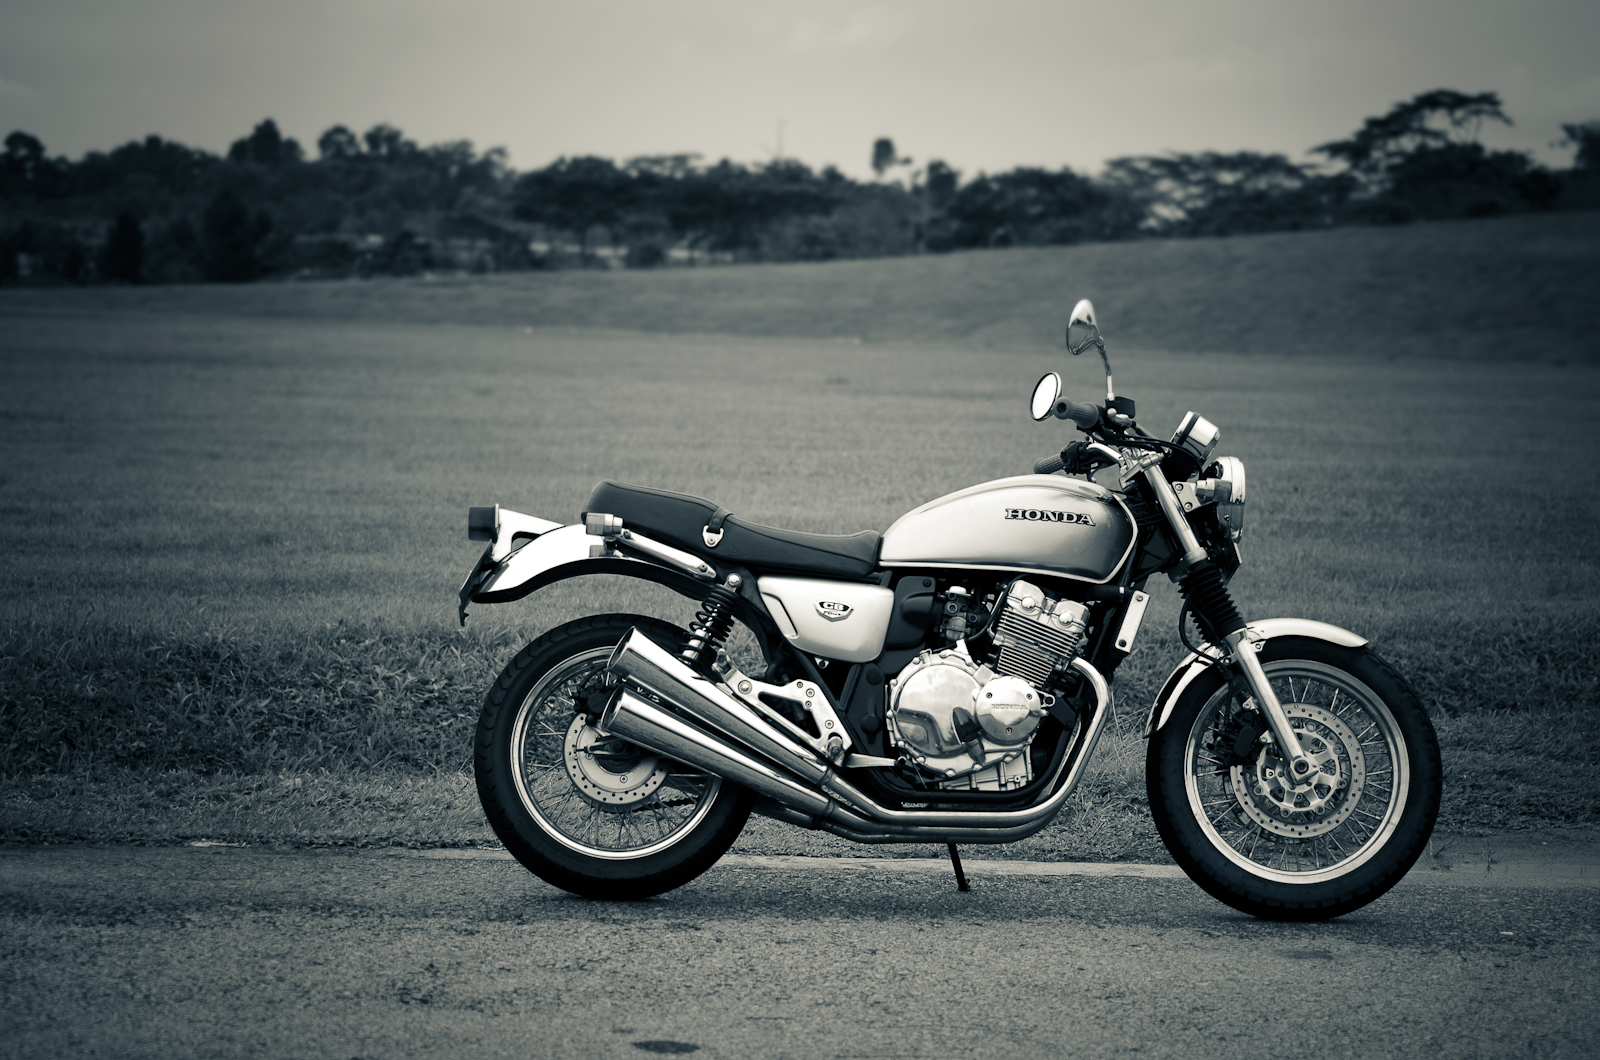 Honda CB400 Four Fully Restore Sold